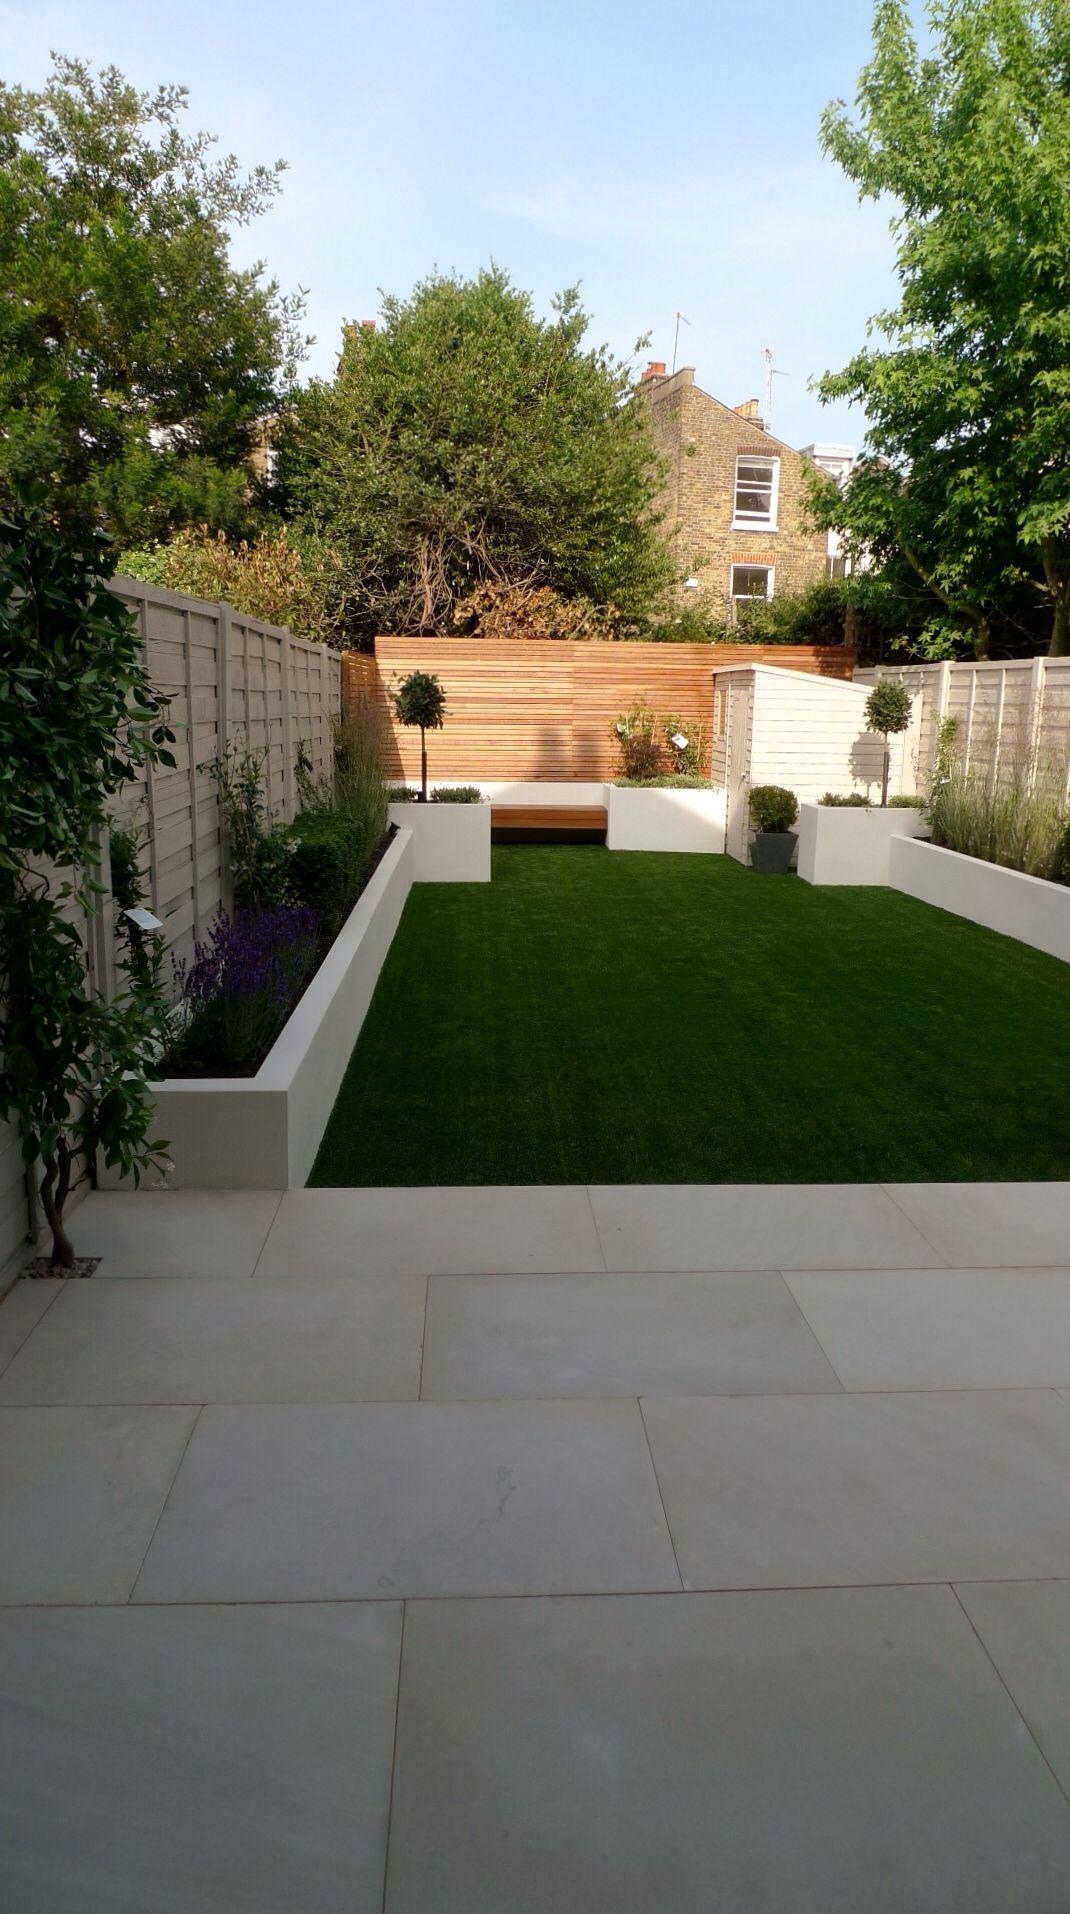 Garden Design Back Garden Design Garden Design London Outdoor Gardens Design